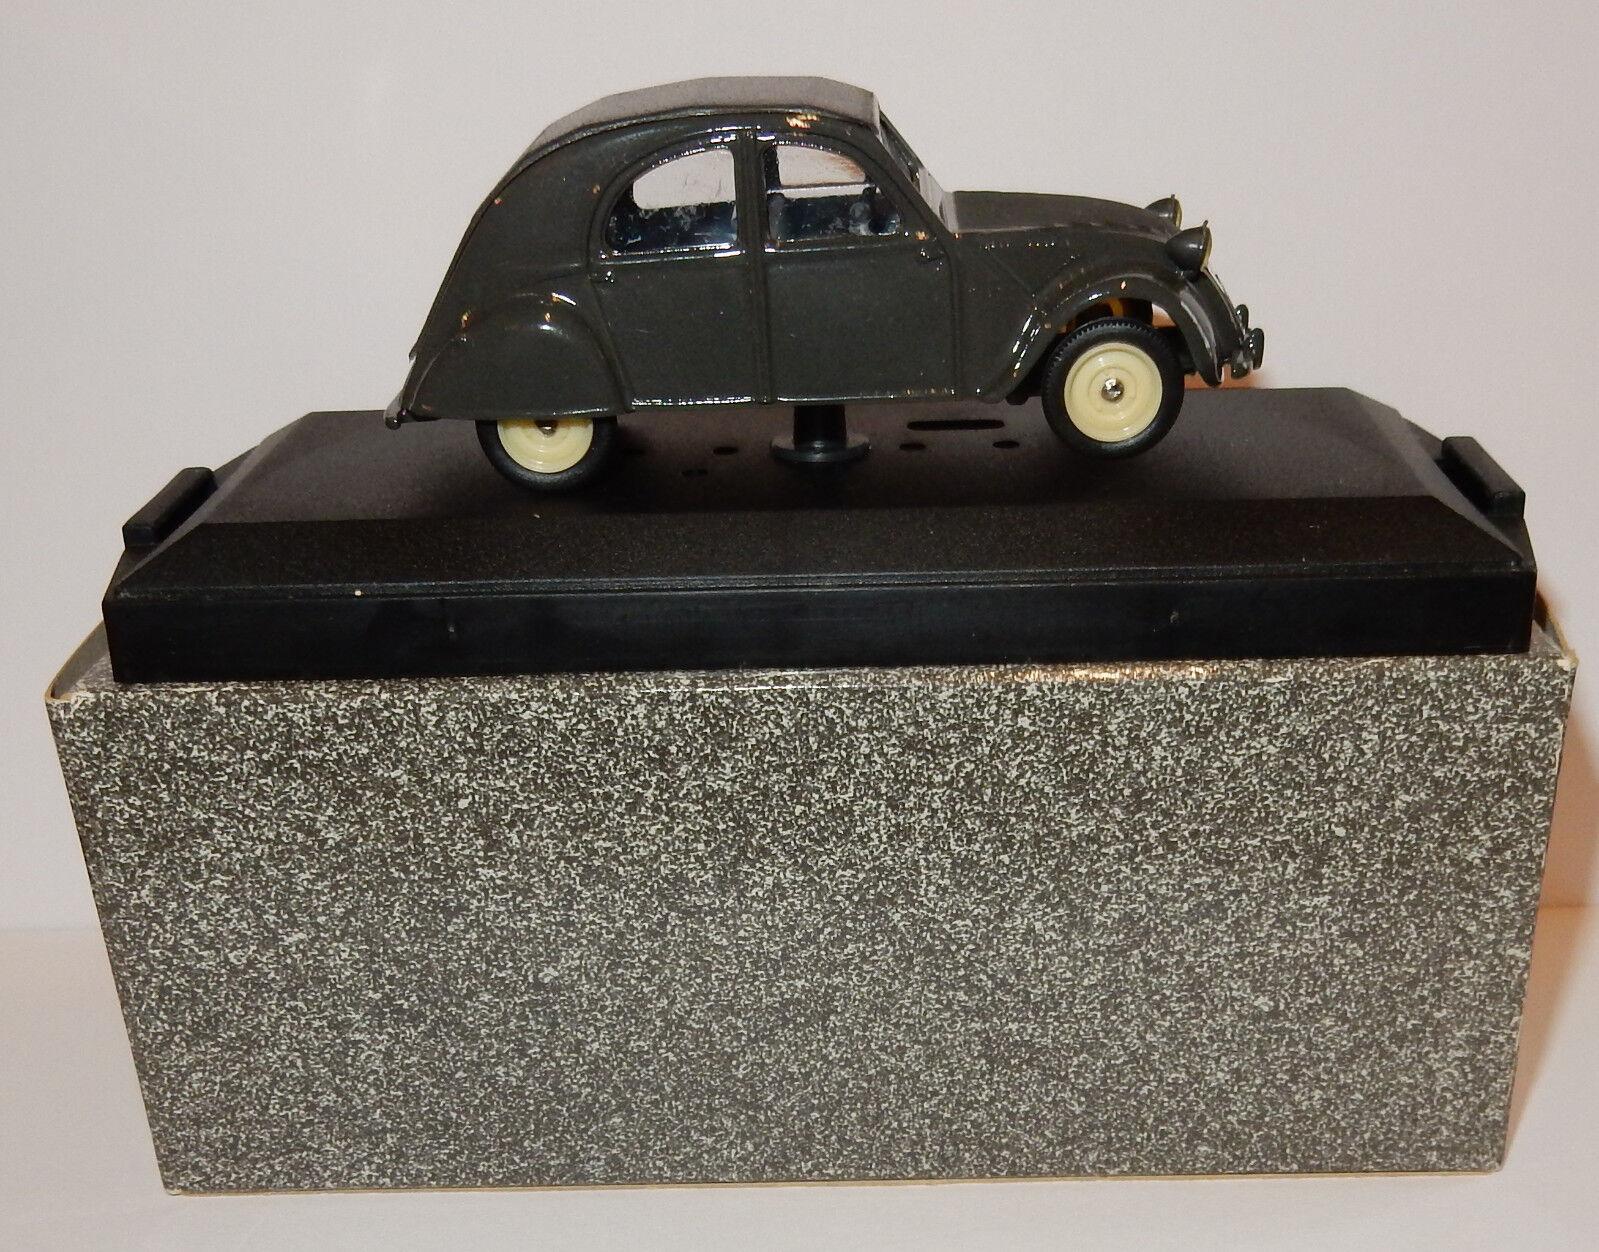 SPEED CITROEN 2CV CLOSED GREY DARK 1953 1953 1953 1 43 REF 520.2 IN BOX b08f9f